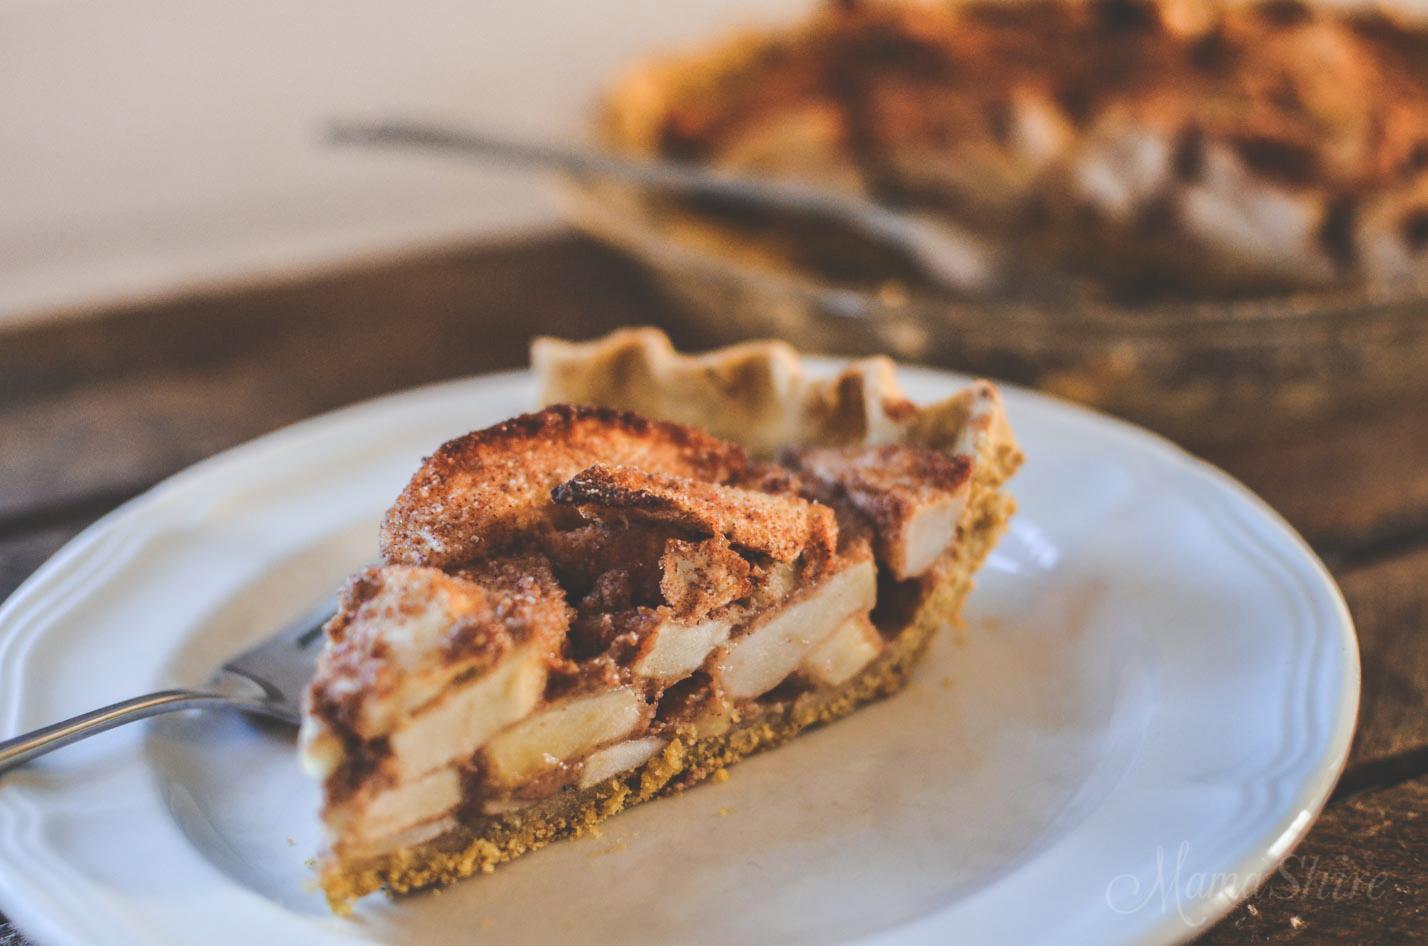 Gluten-Free Apple Pie Recipe - MamaShire